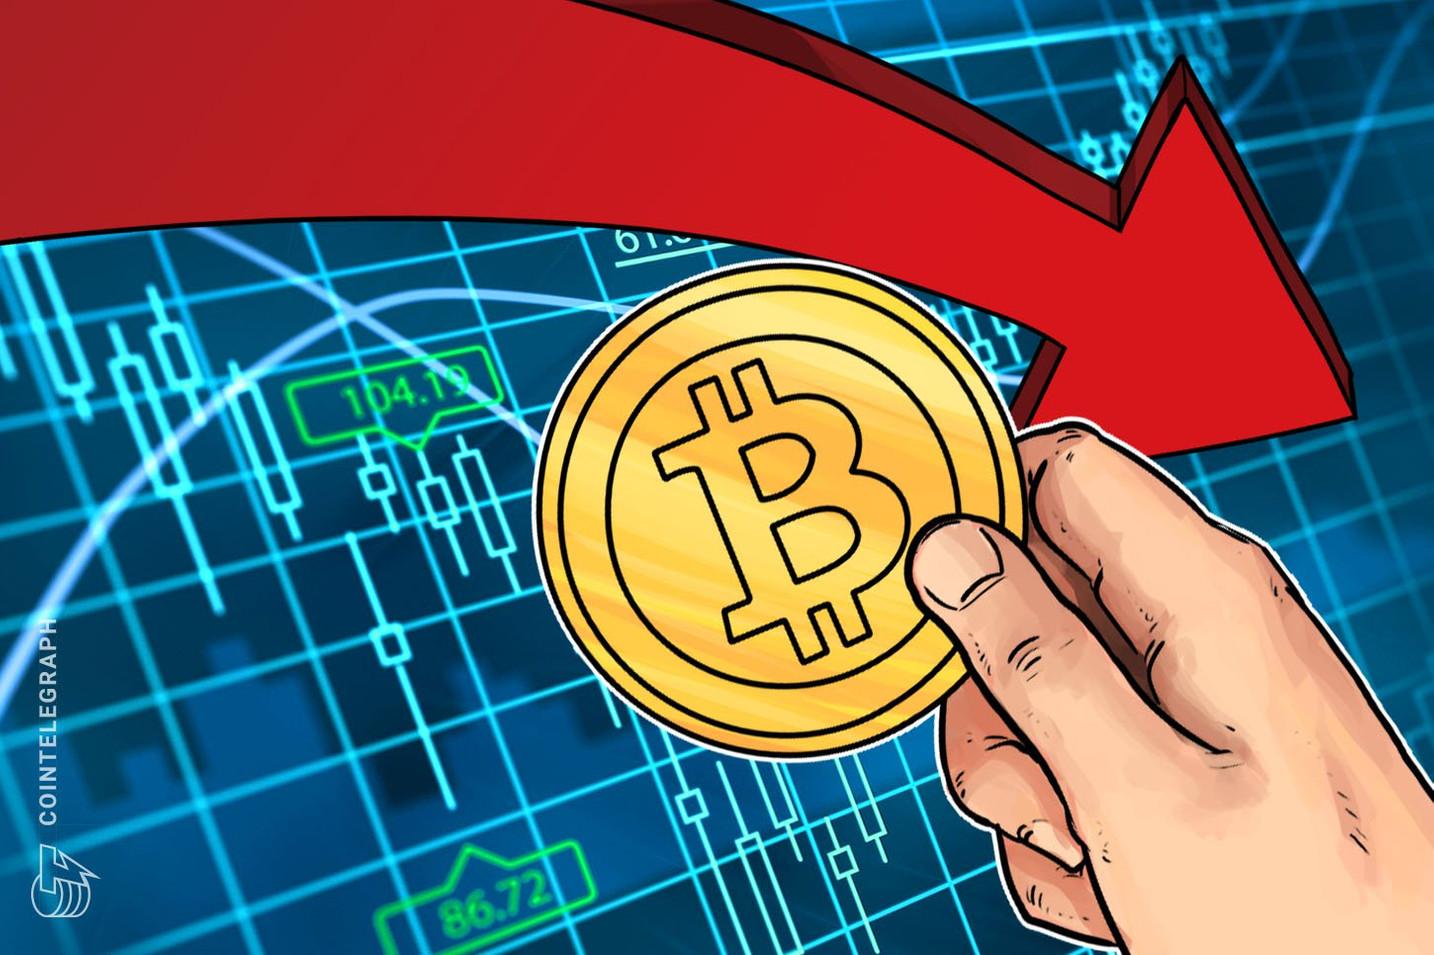 Bitcoin's Price Will Go Below $3,000, Anthony Pompliano Tells Mainstream Media